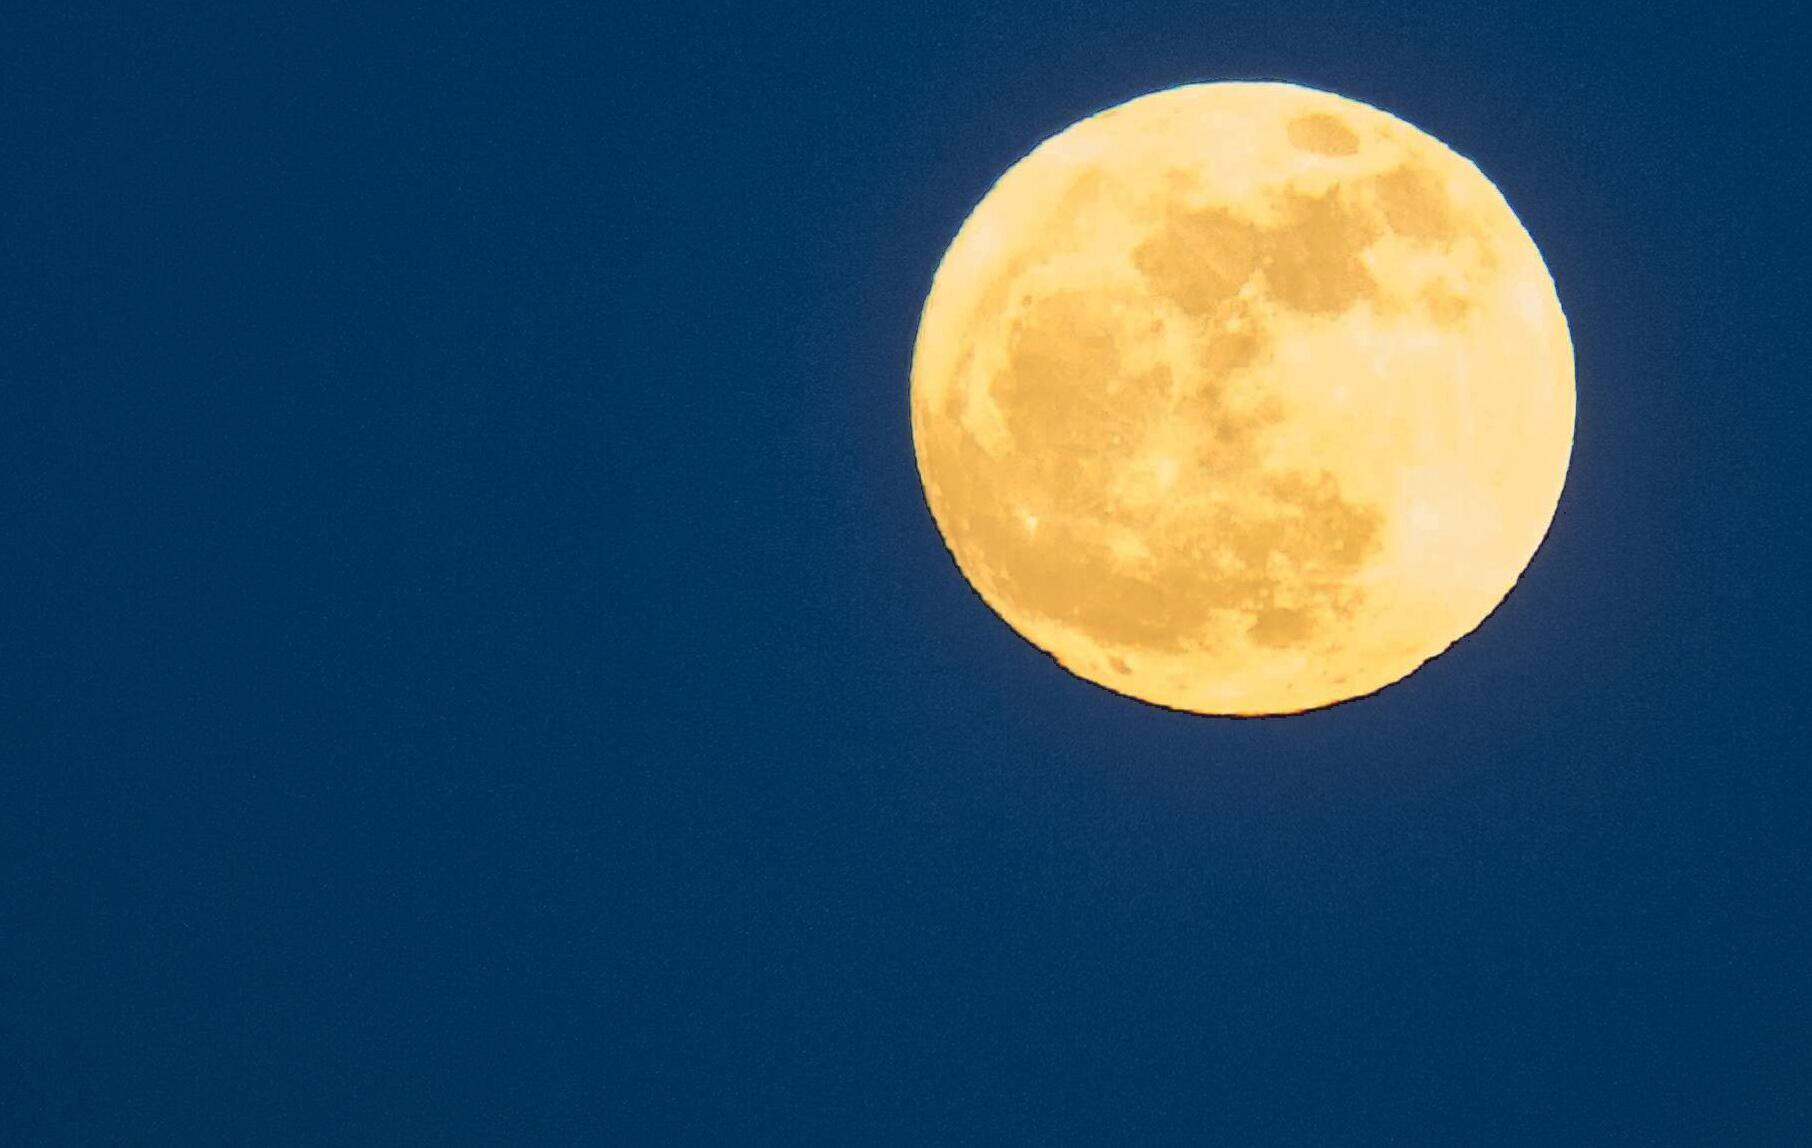 Bild zu Mond, Einfluss, Mensch, Wissenschaft